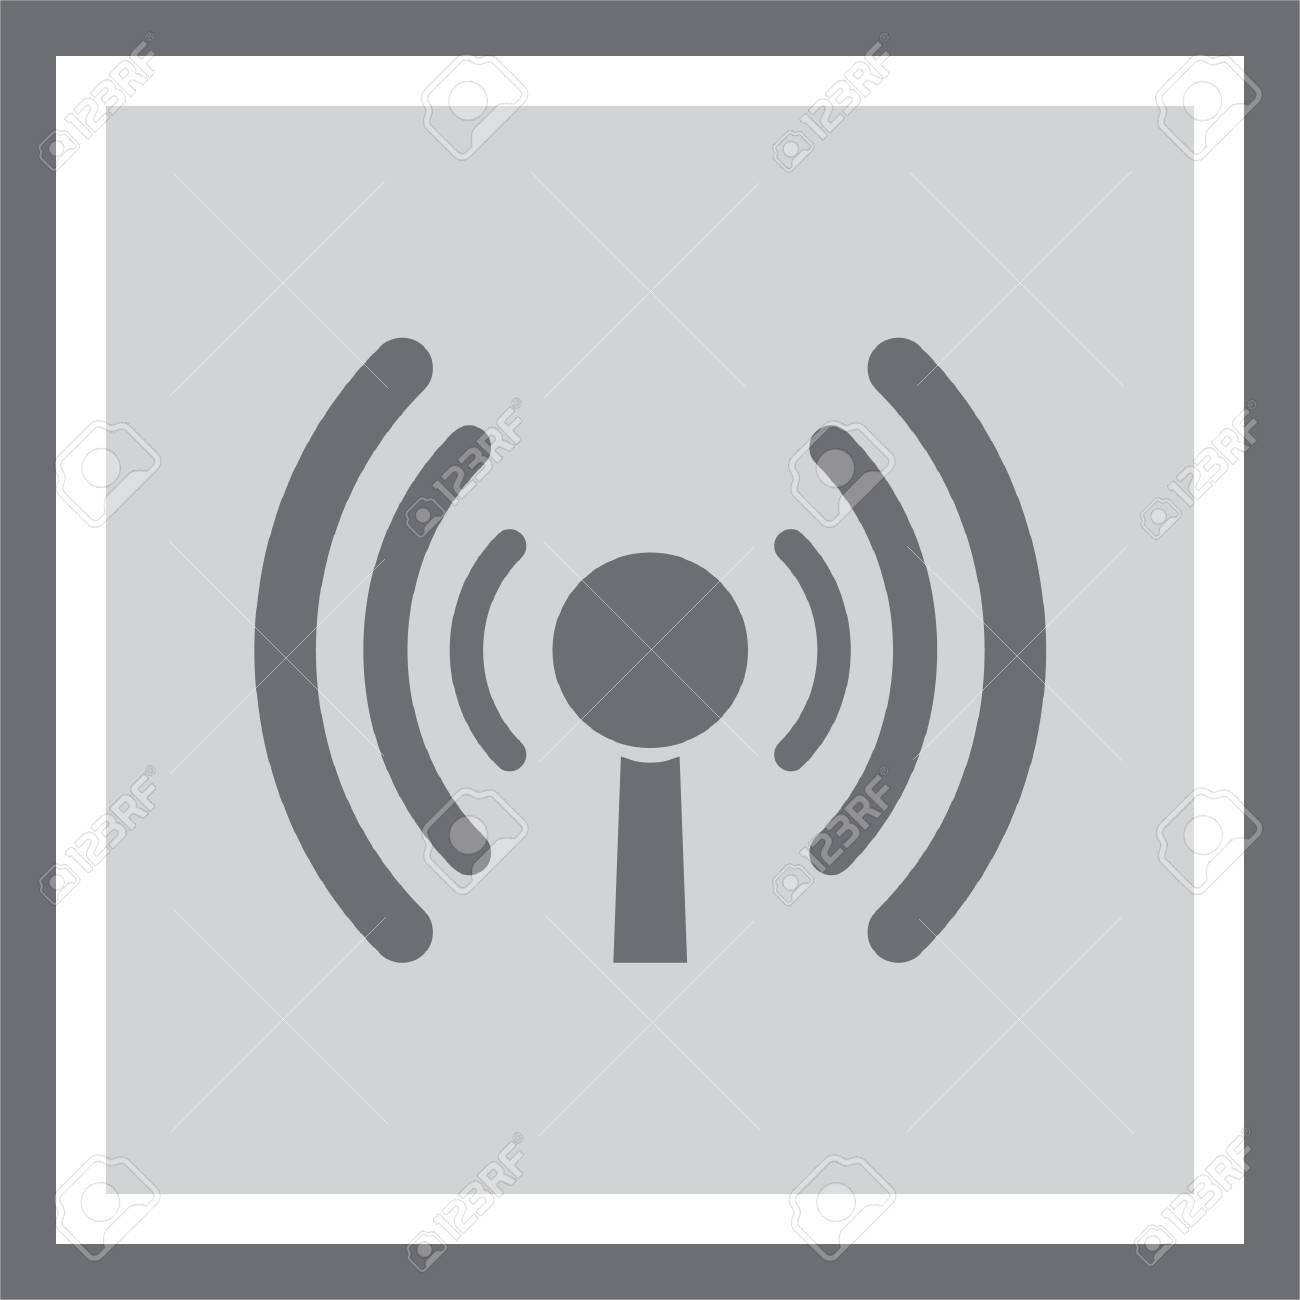 Großzügig Wlan Symbol Bilder - Verdrahtungsideen - korsmi.info